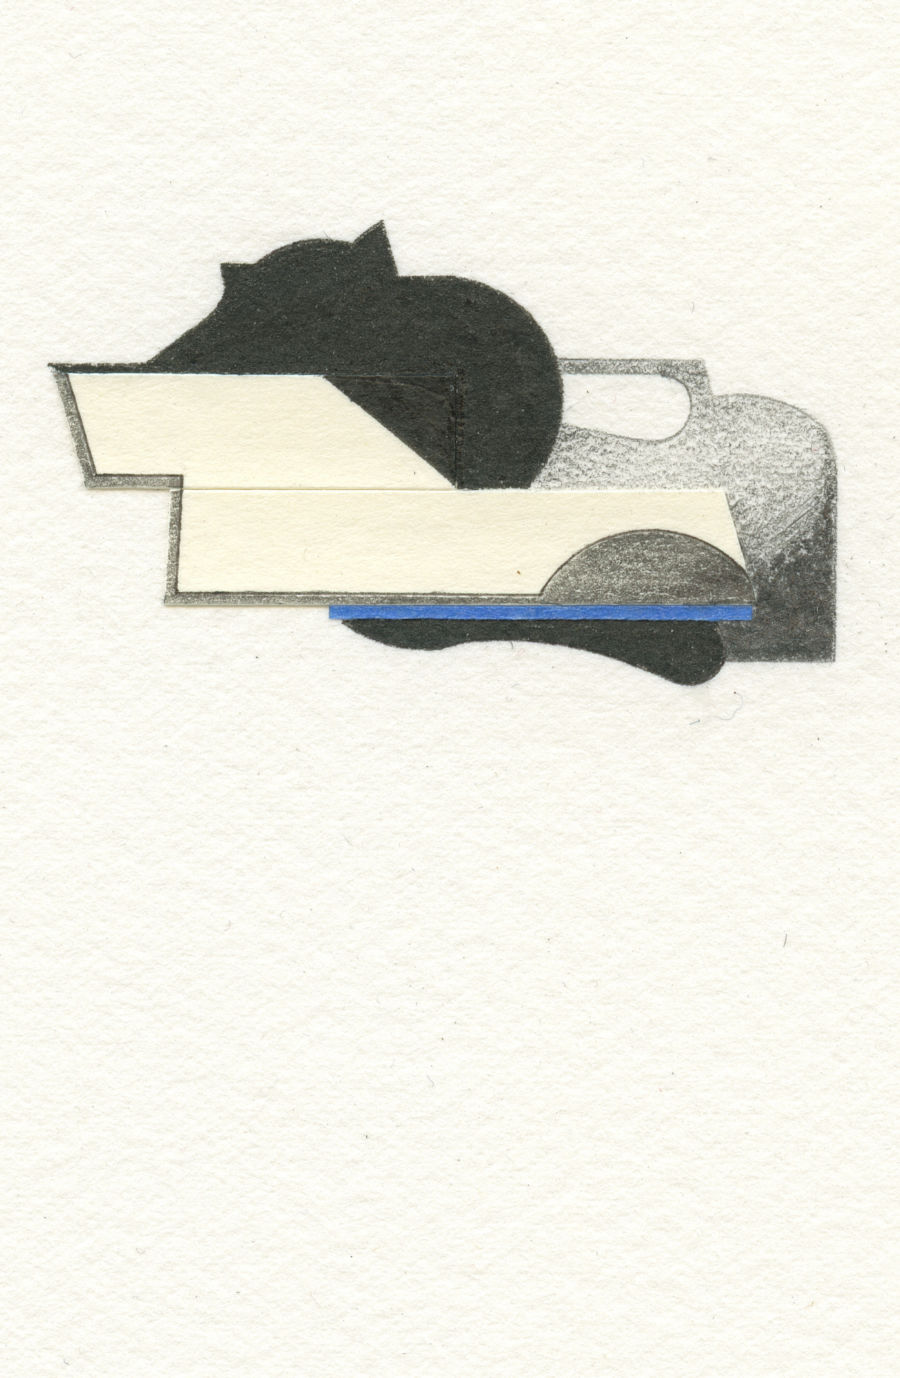 Surtap Observer (Copfer Dam)